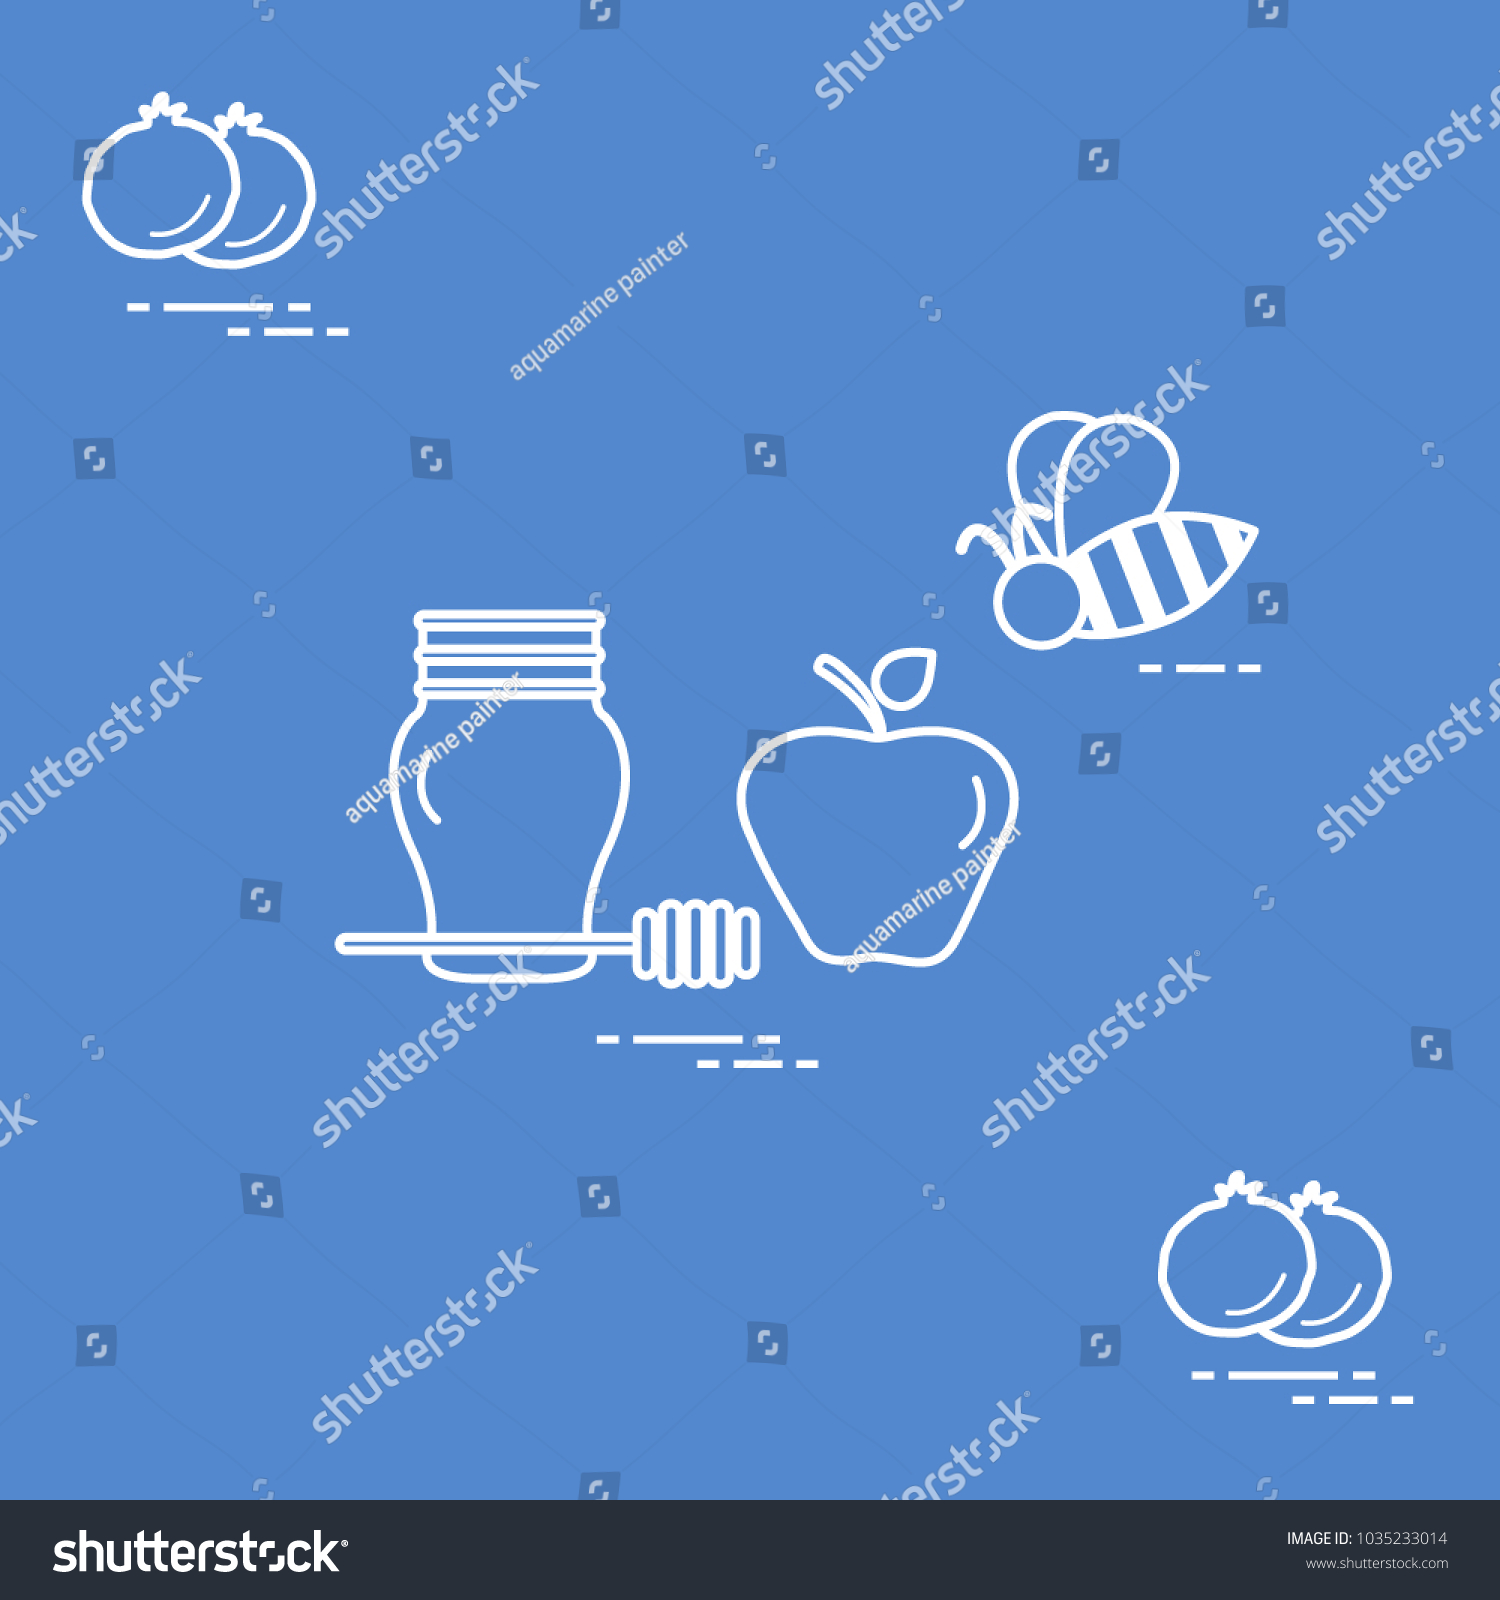 Apple honey rosh hashanah pomegranate bee stock vector 1035233014 apple in honey in rosh hashanah pomegranate bee traditional jewish food and symbols biocorpaavc